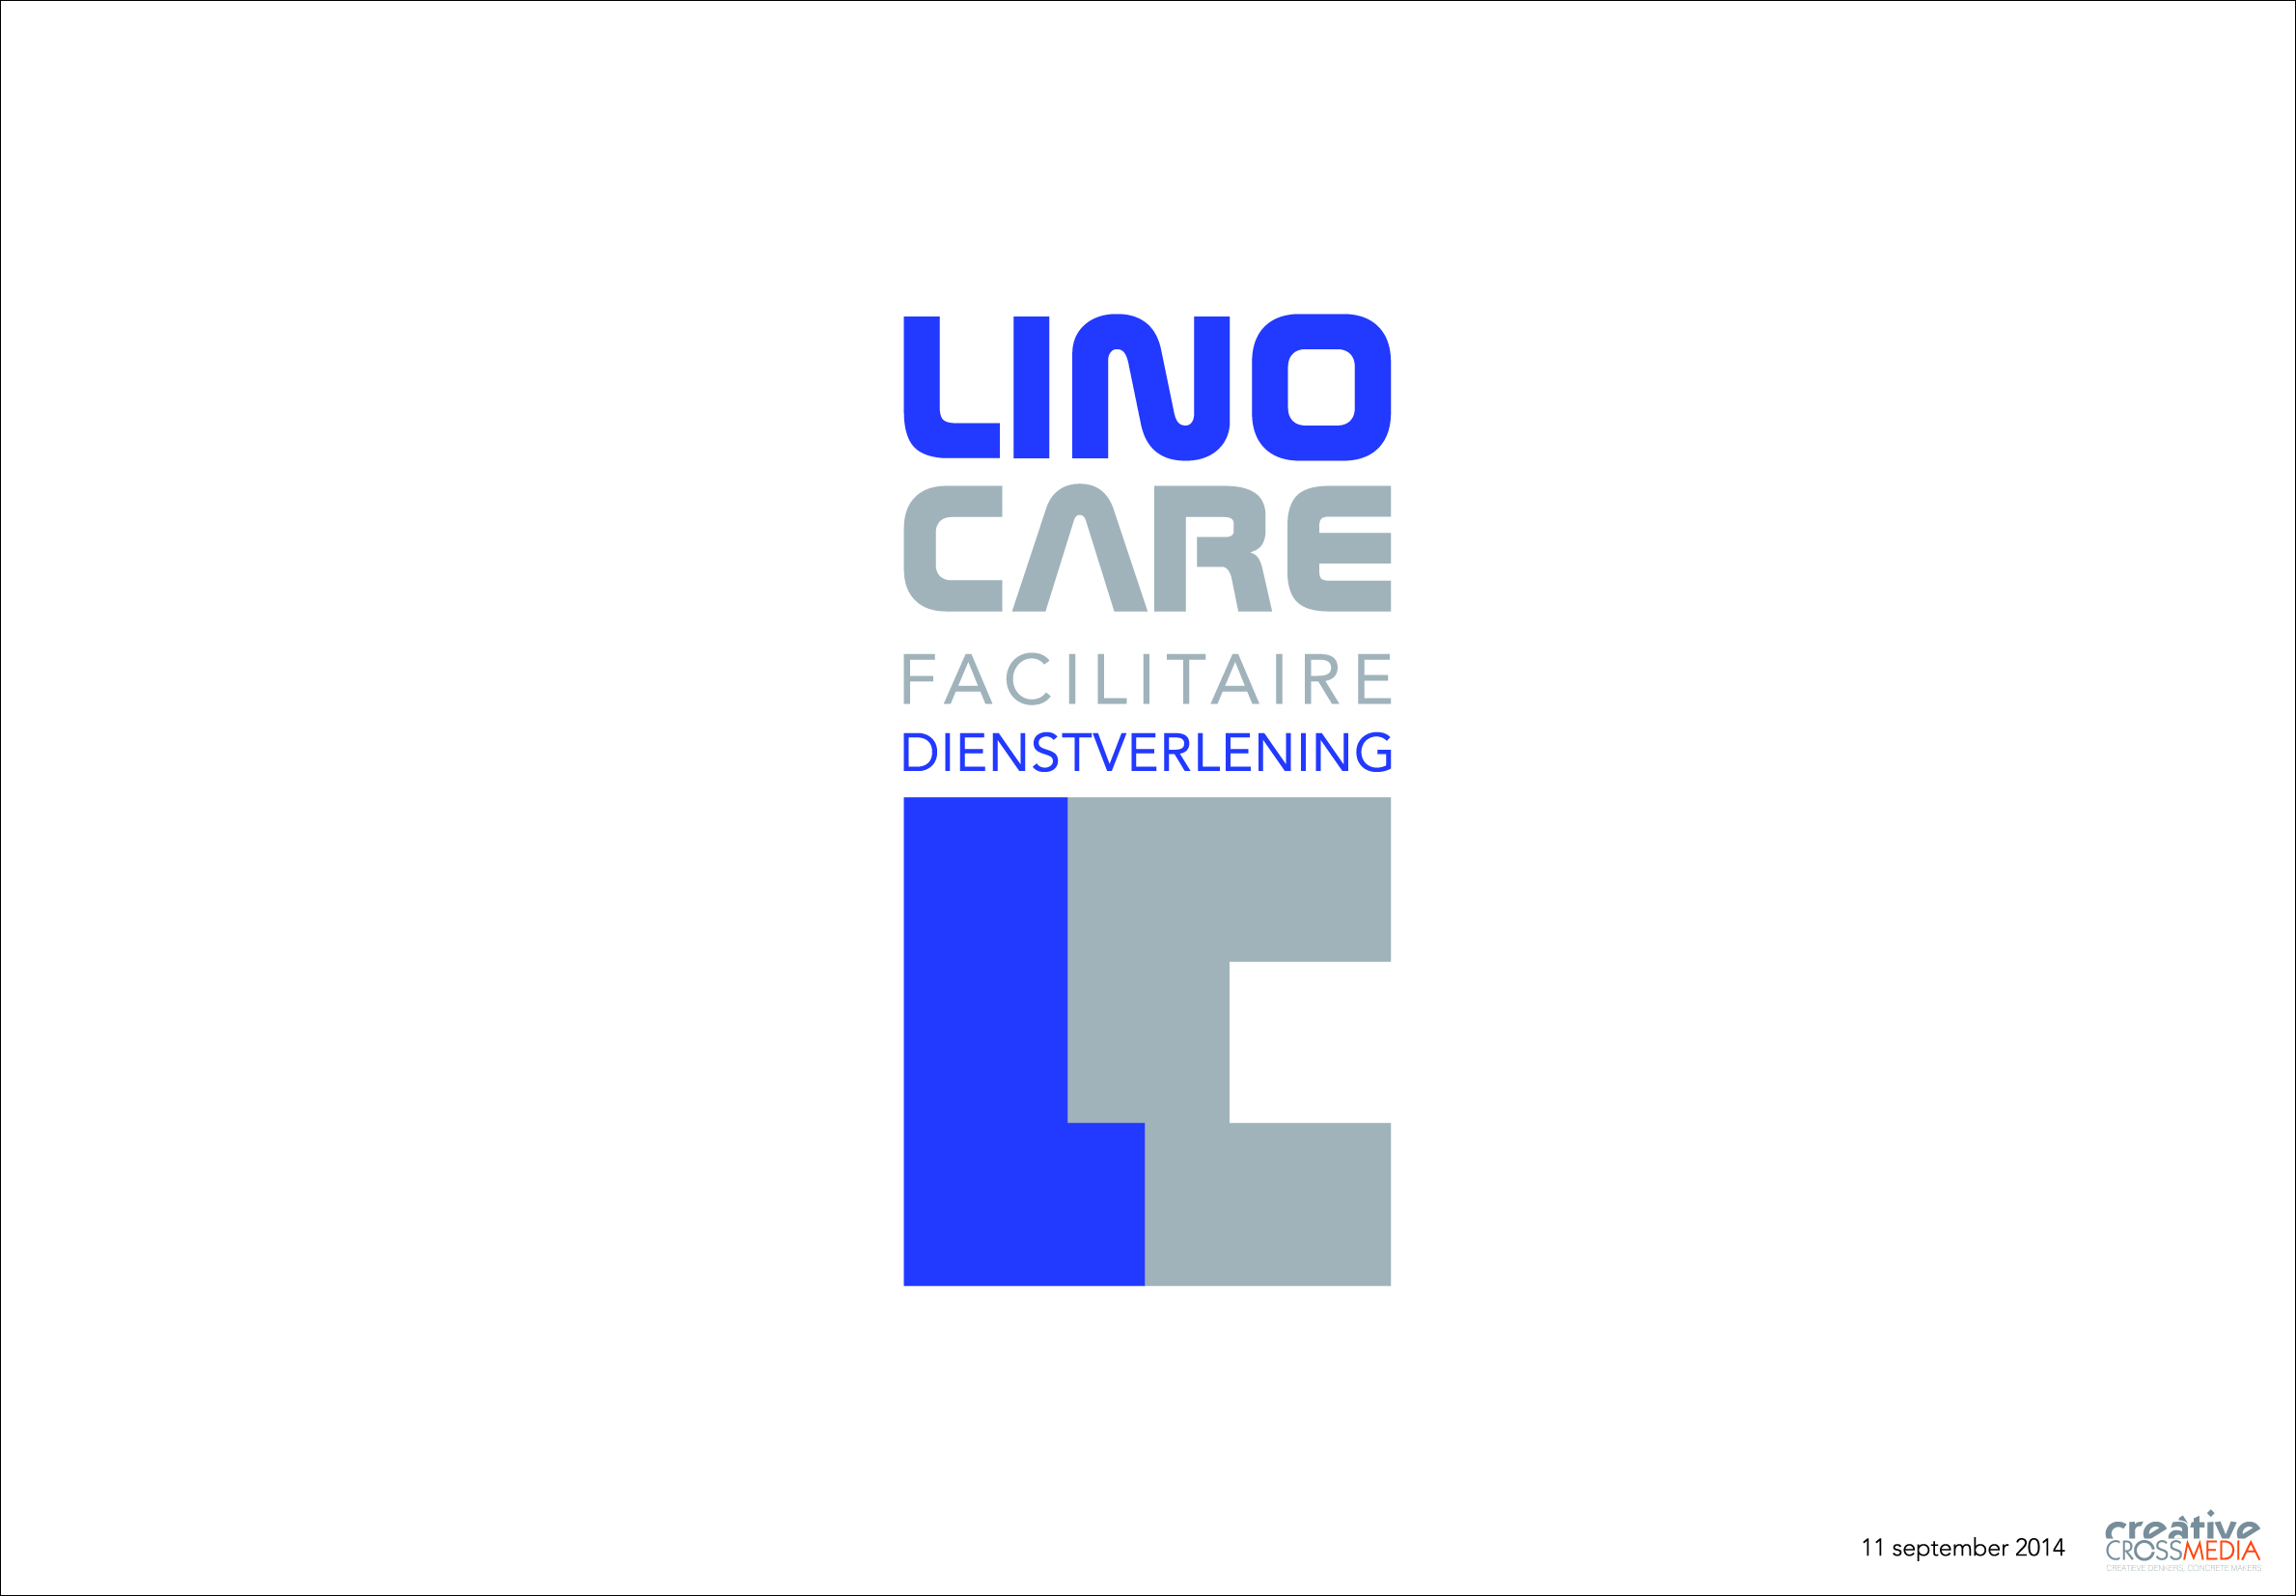 Linocare